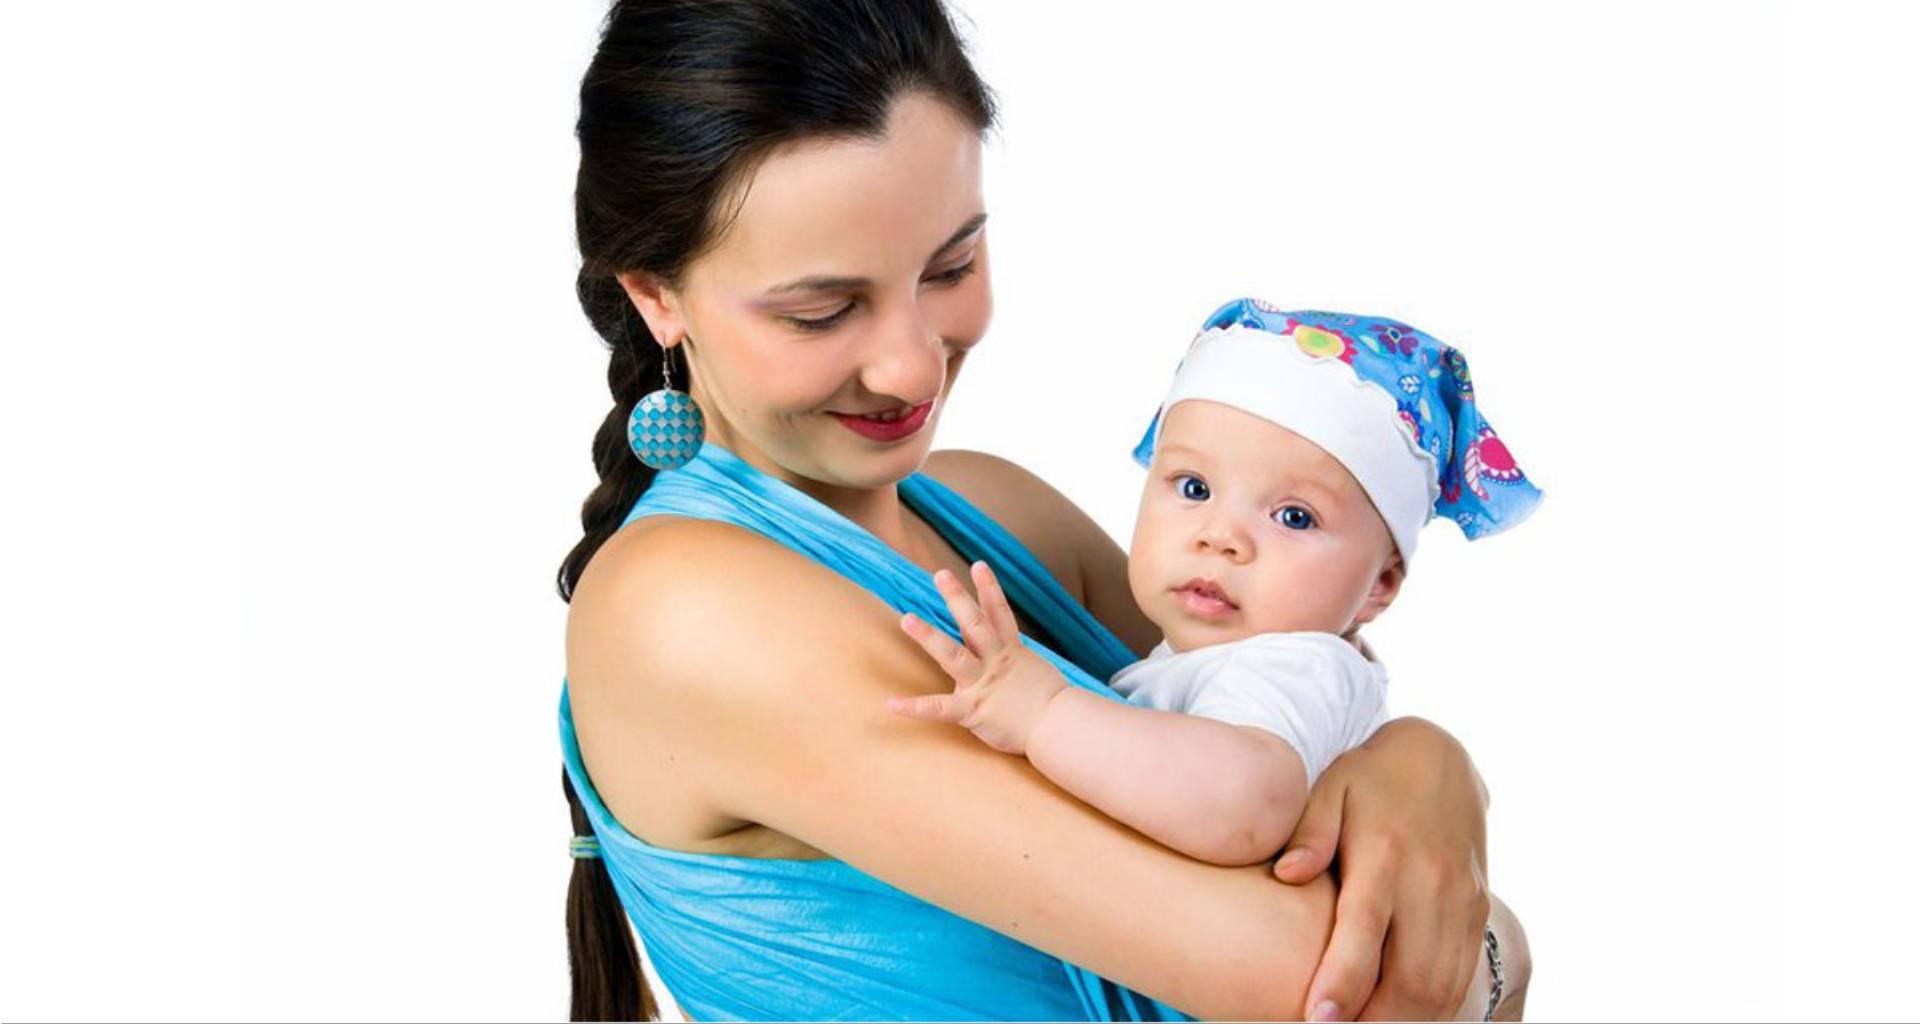 Chusta dla niemowlaka